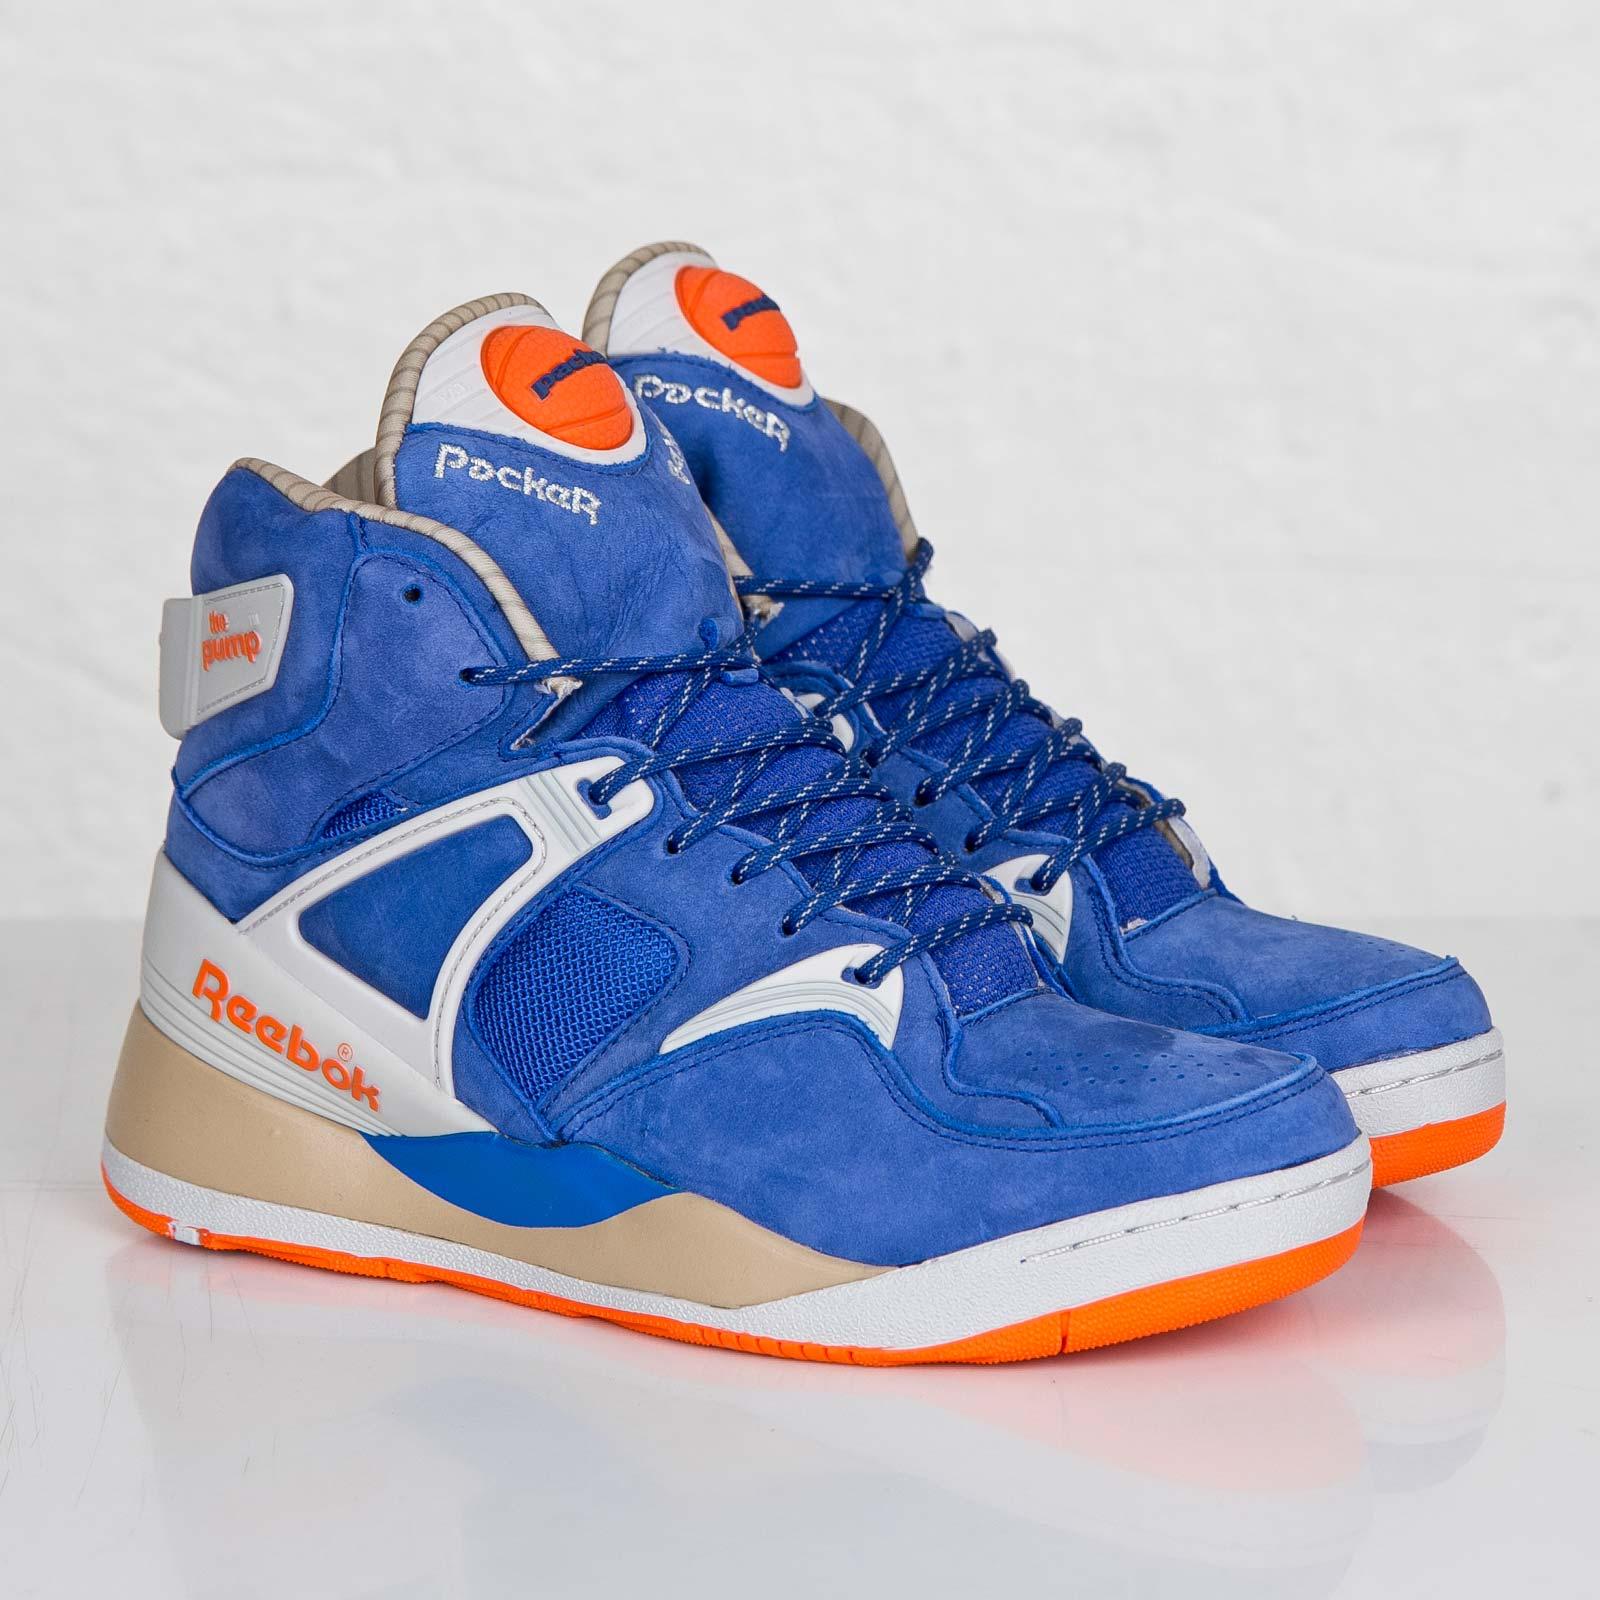 a20004a8d3ef Reebok The Pump Certified - M44388 - Sneakersnstuff   sneakers ...